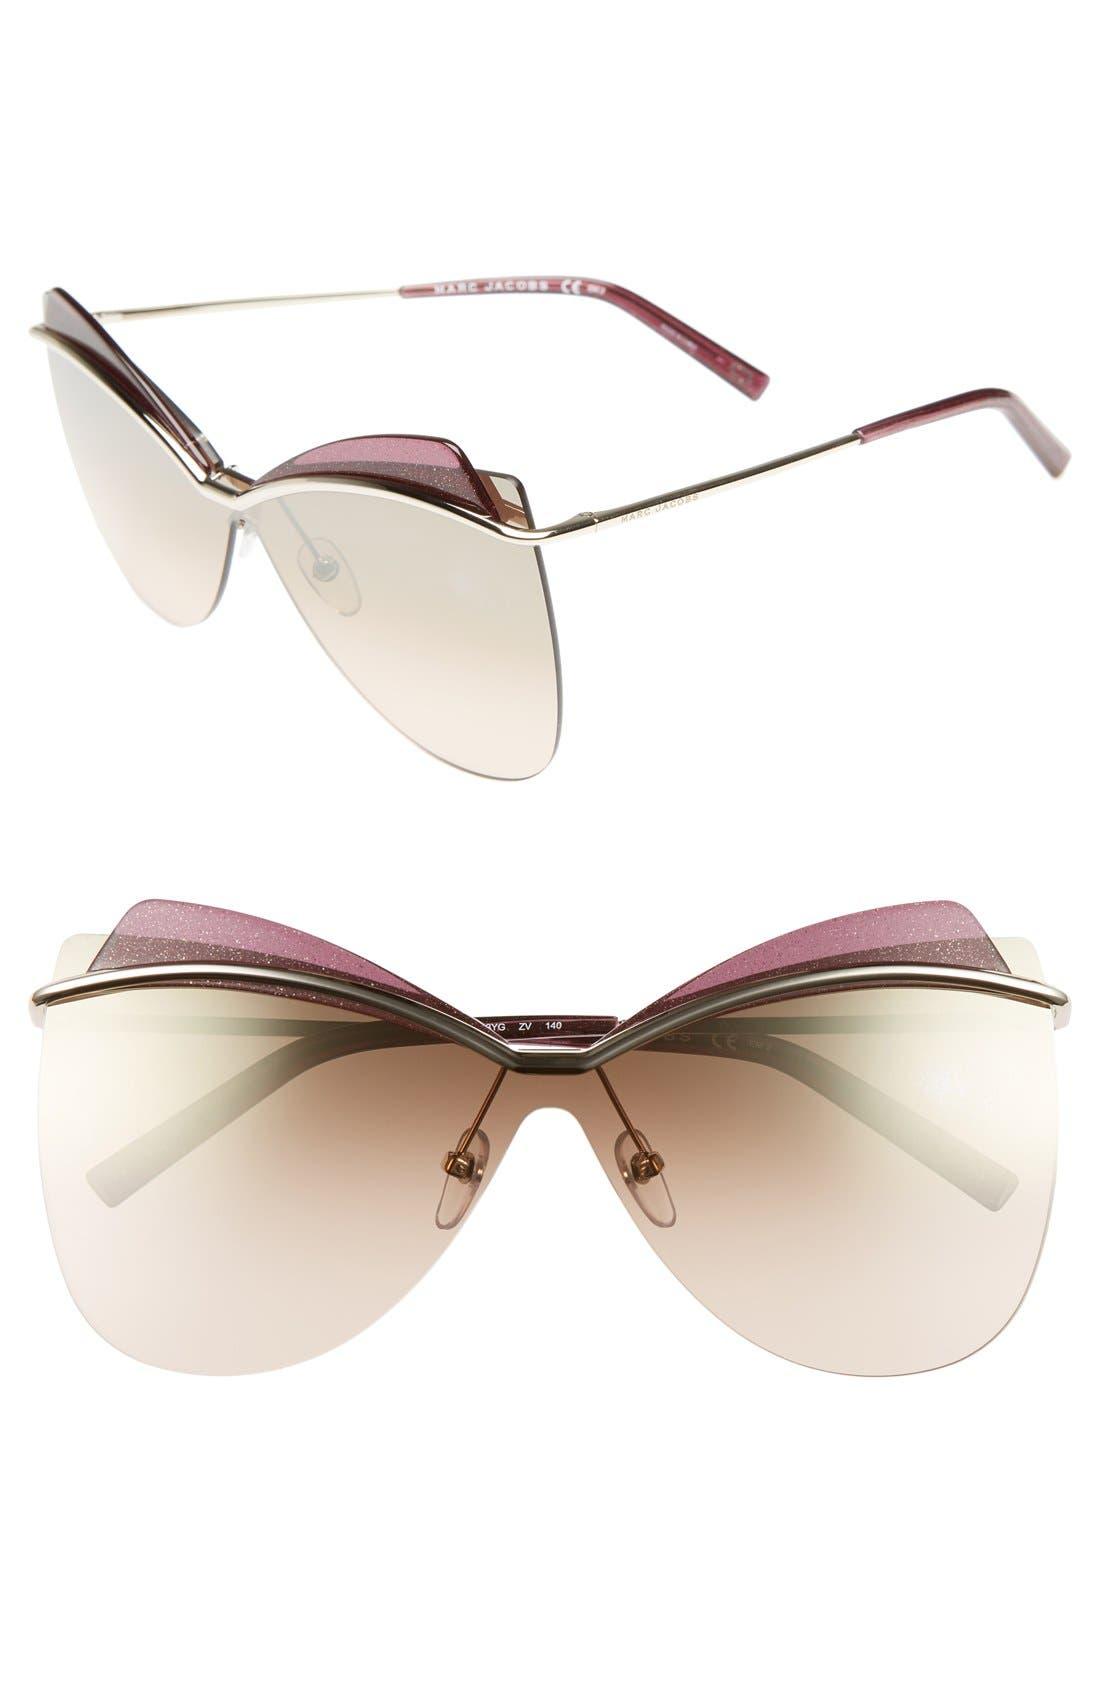 67mm Sunglasses,                         Main,                         color,